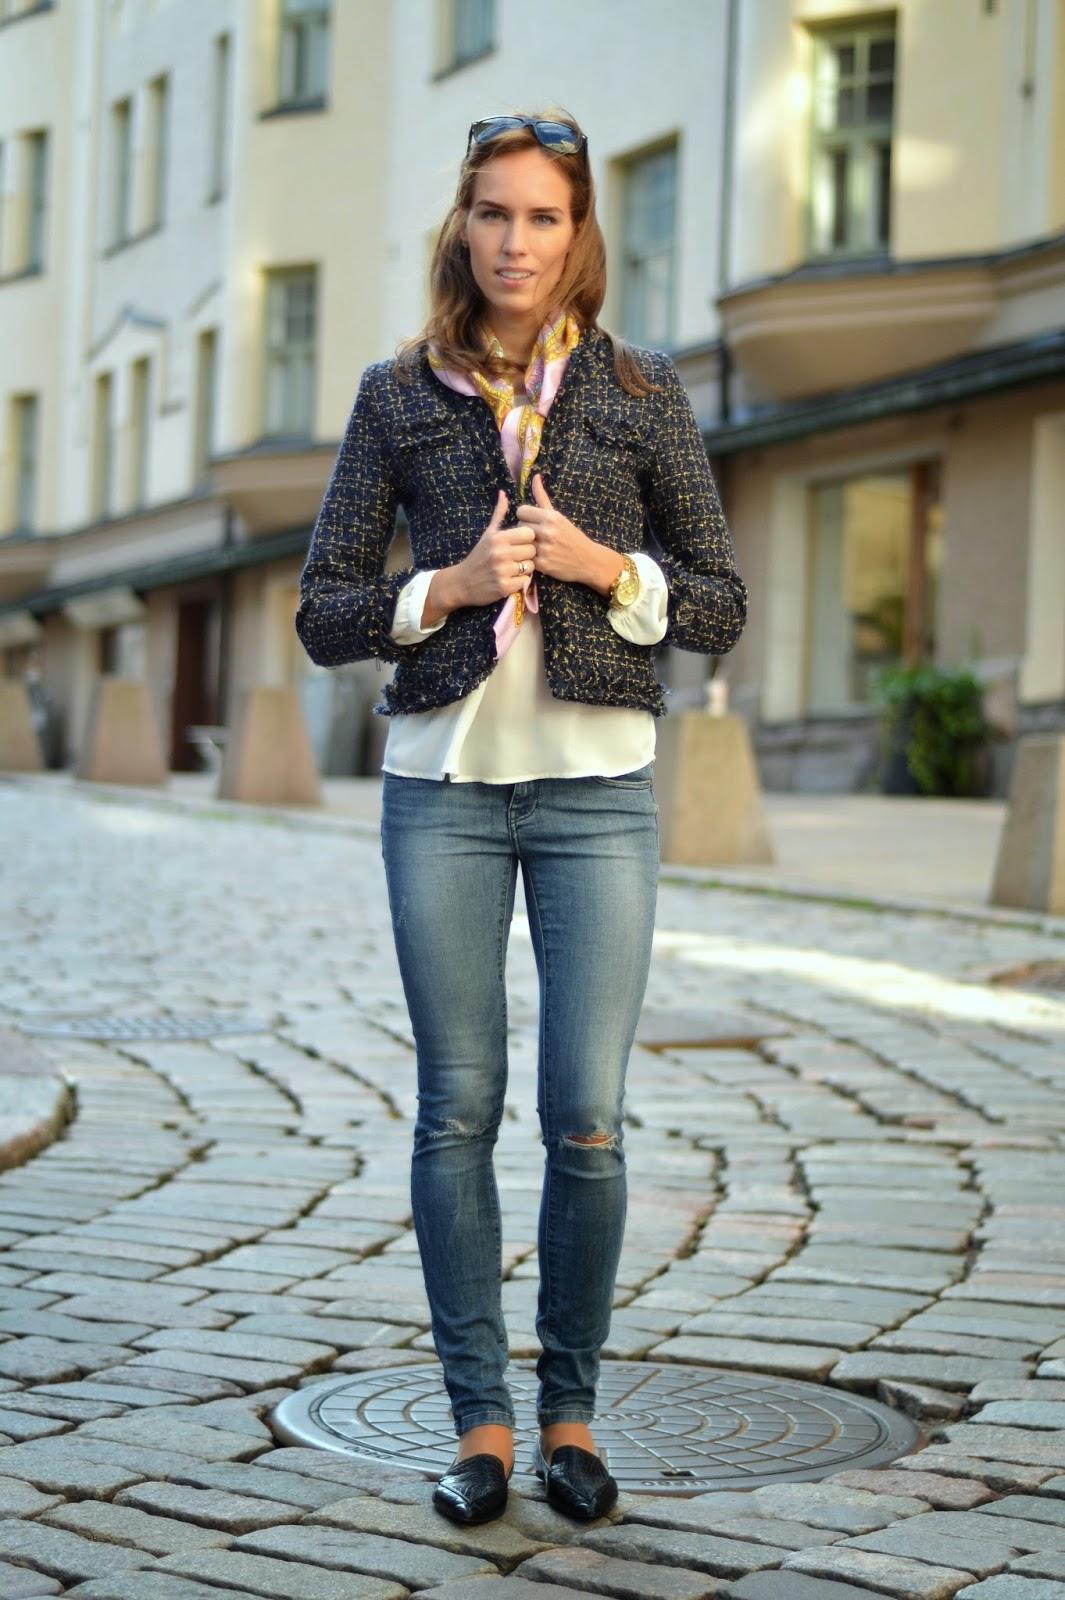 sheinside-jacket-zara-jeans-motivi-scarf